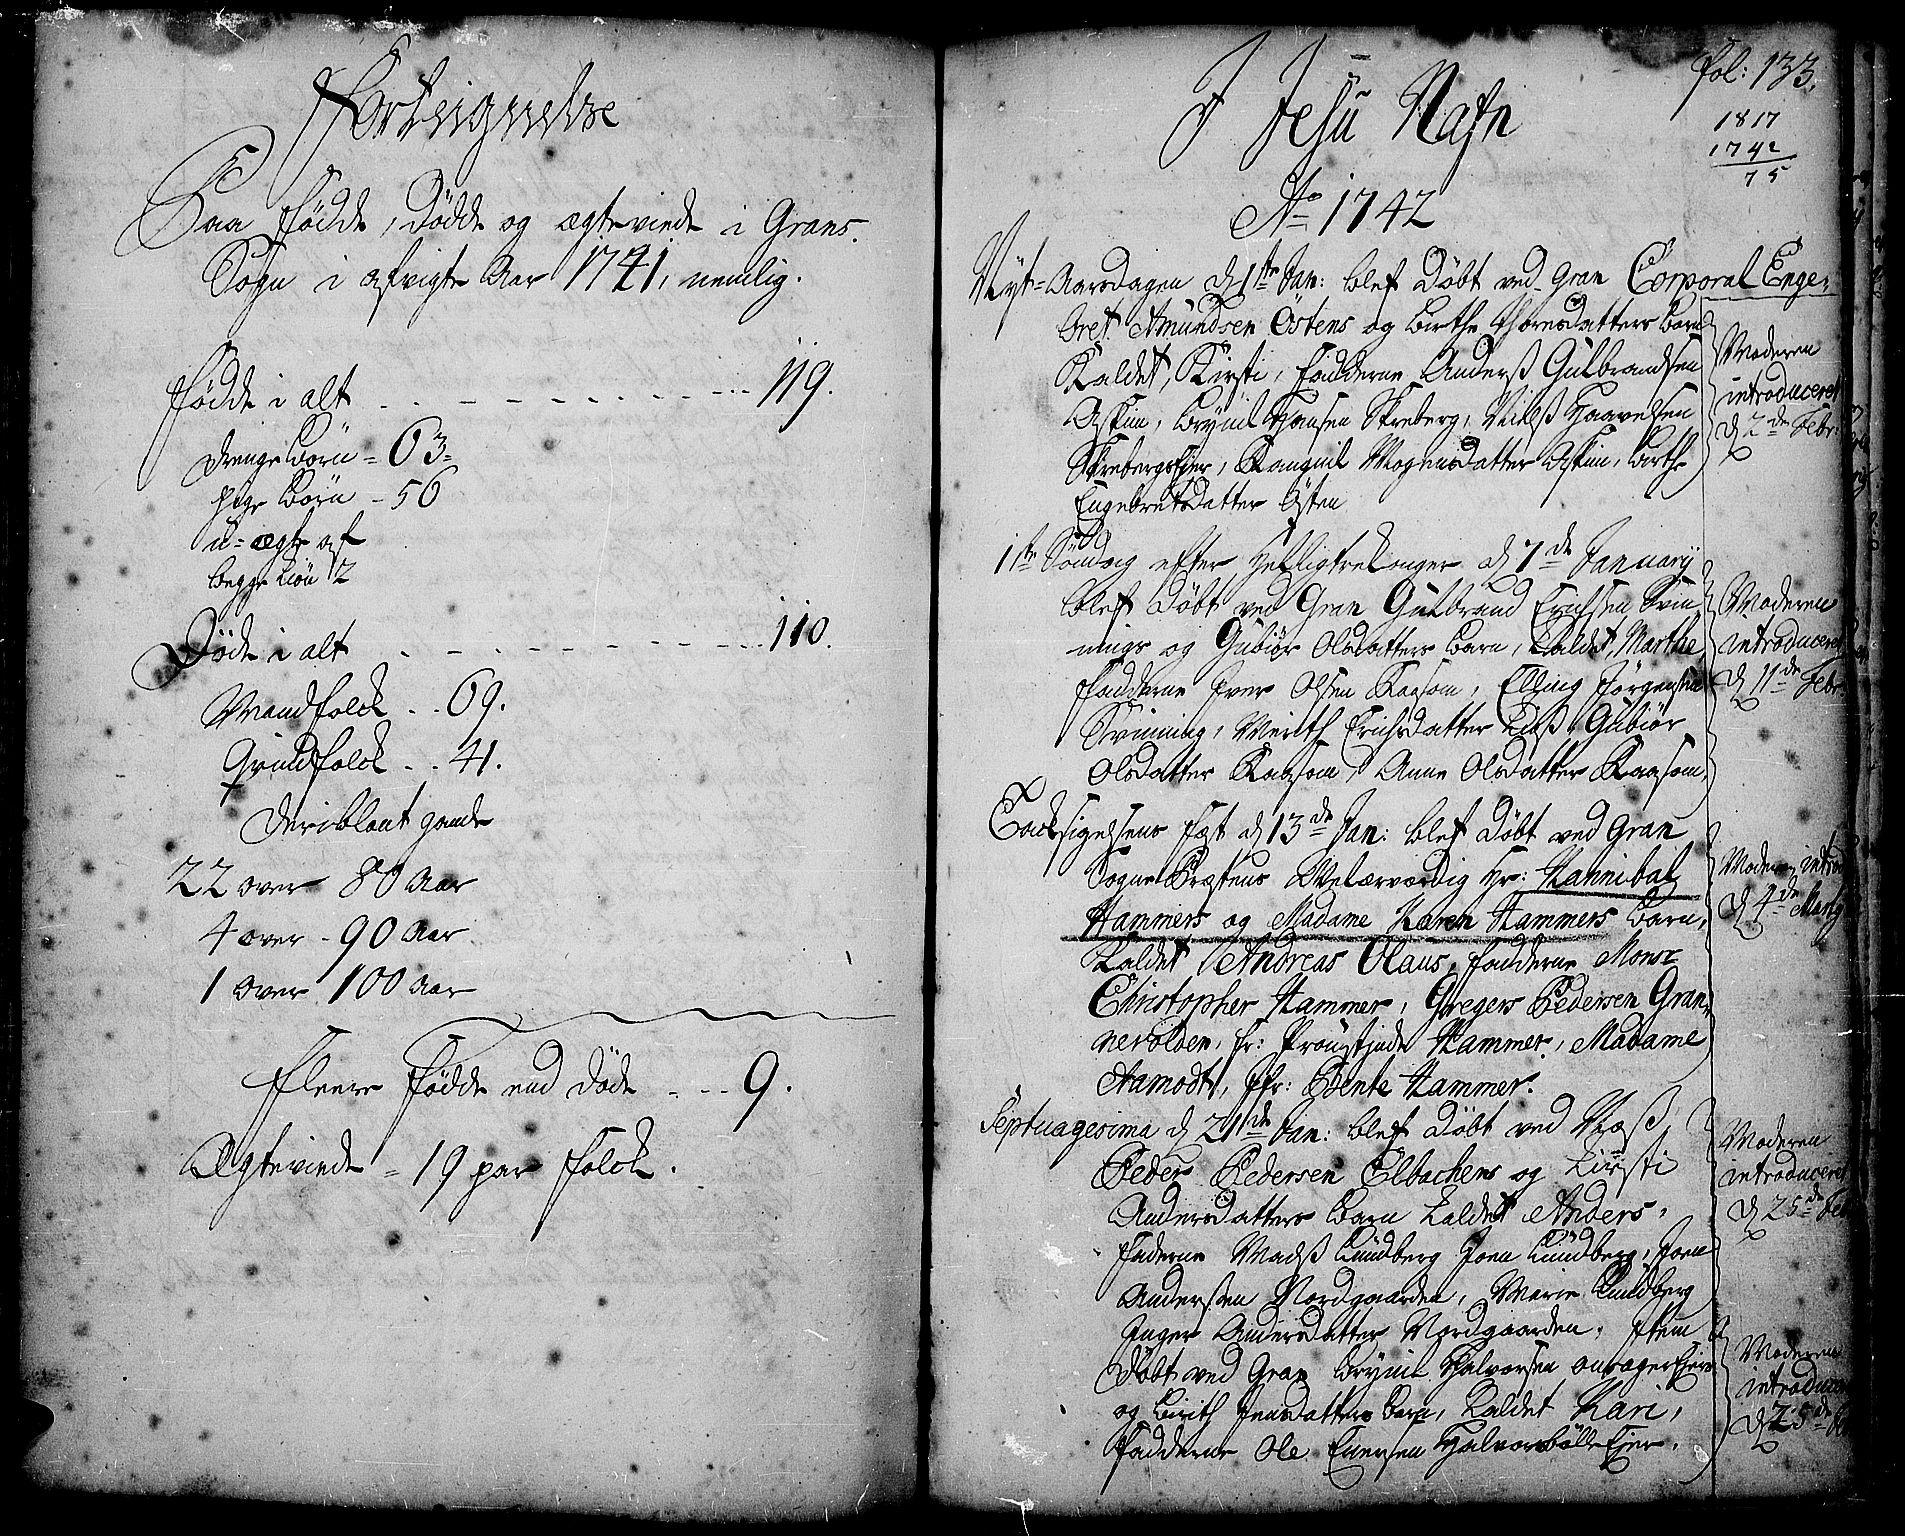 SAH, Gran prestekontor, Ministerialbok nr. 2, 1732-1744, s. 133